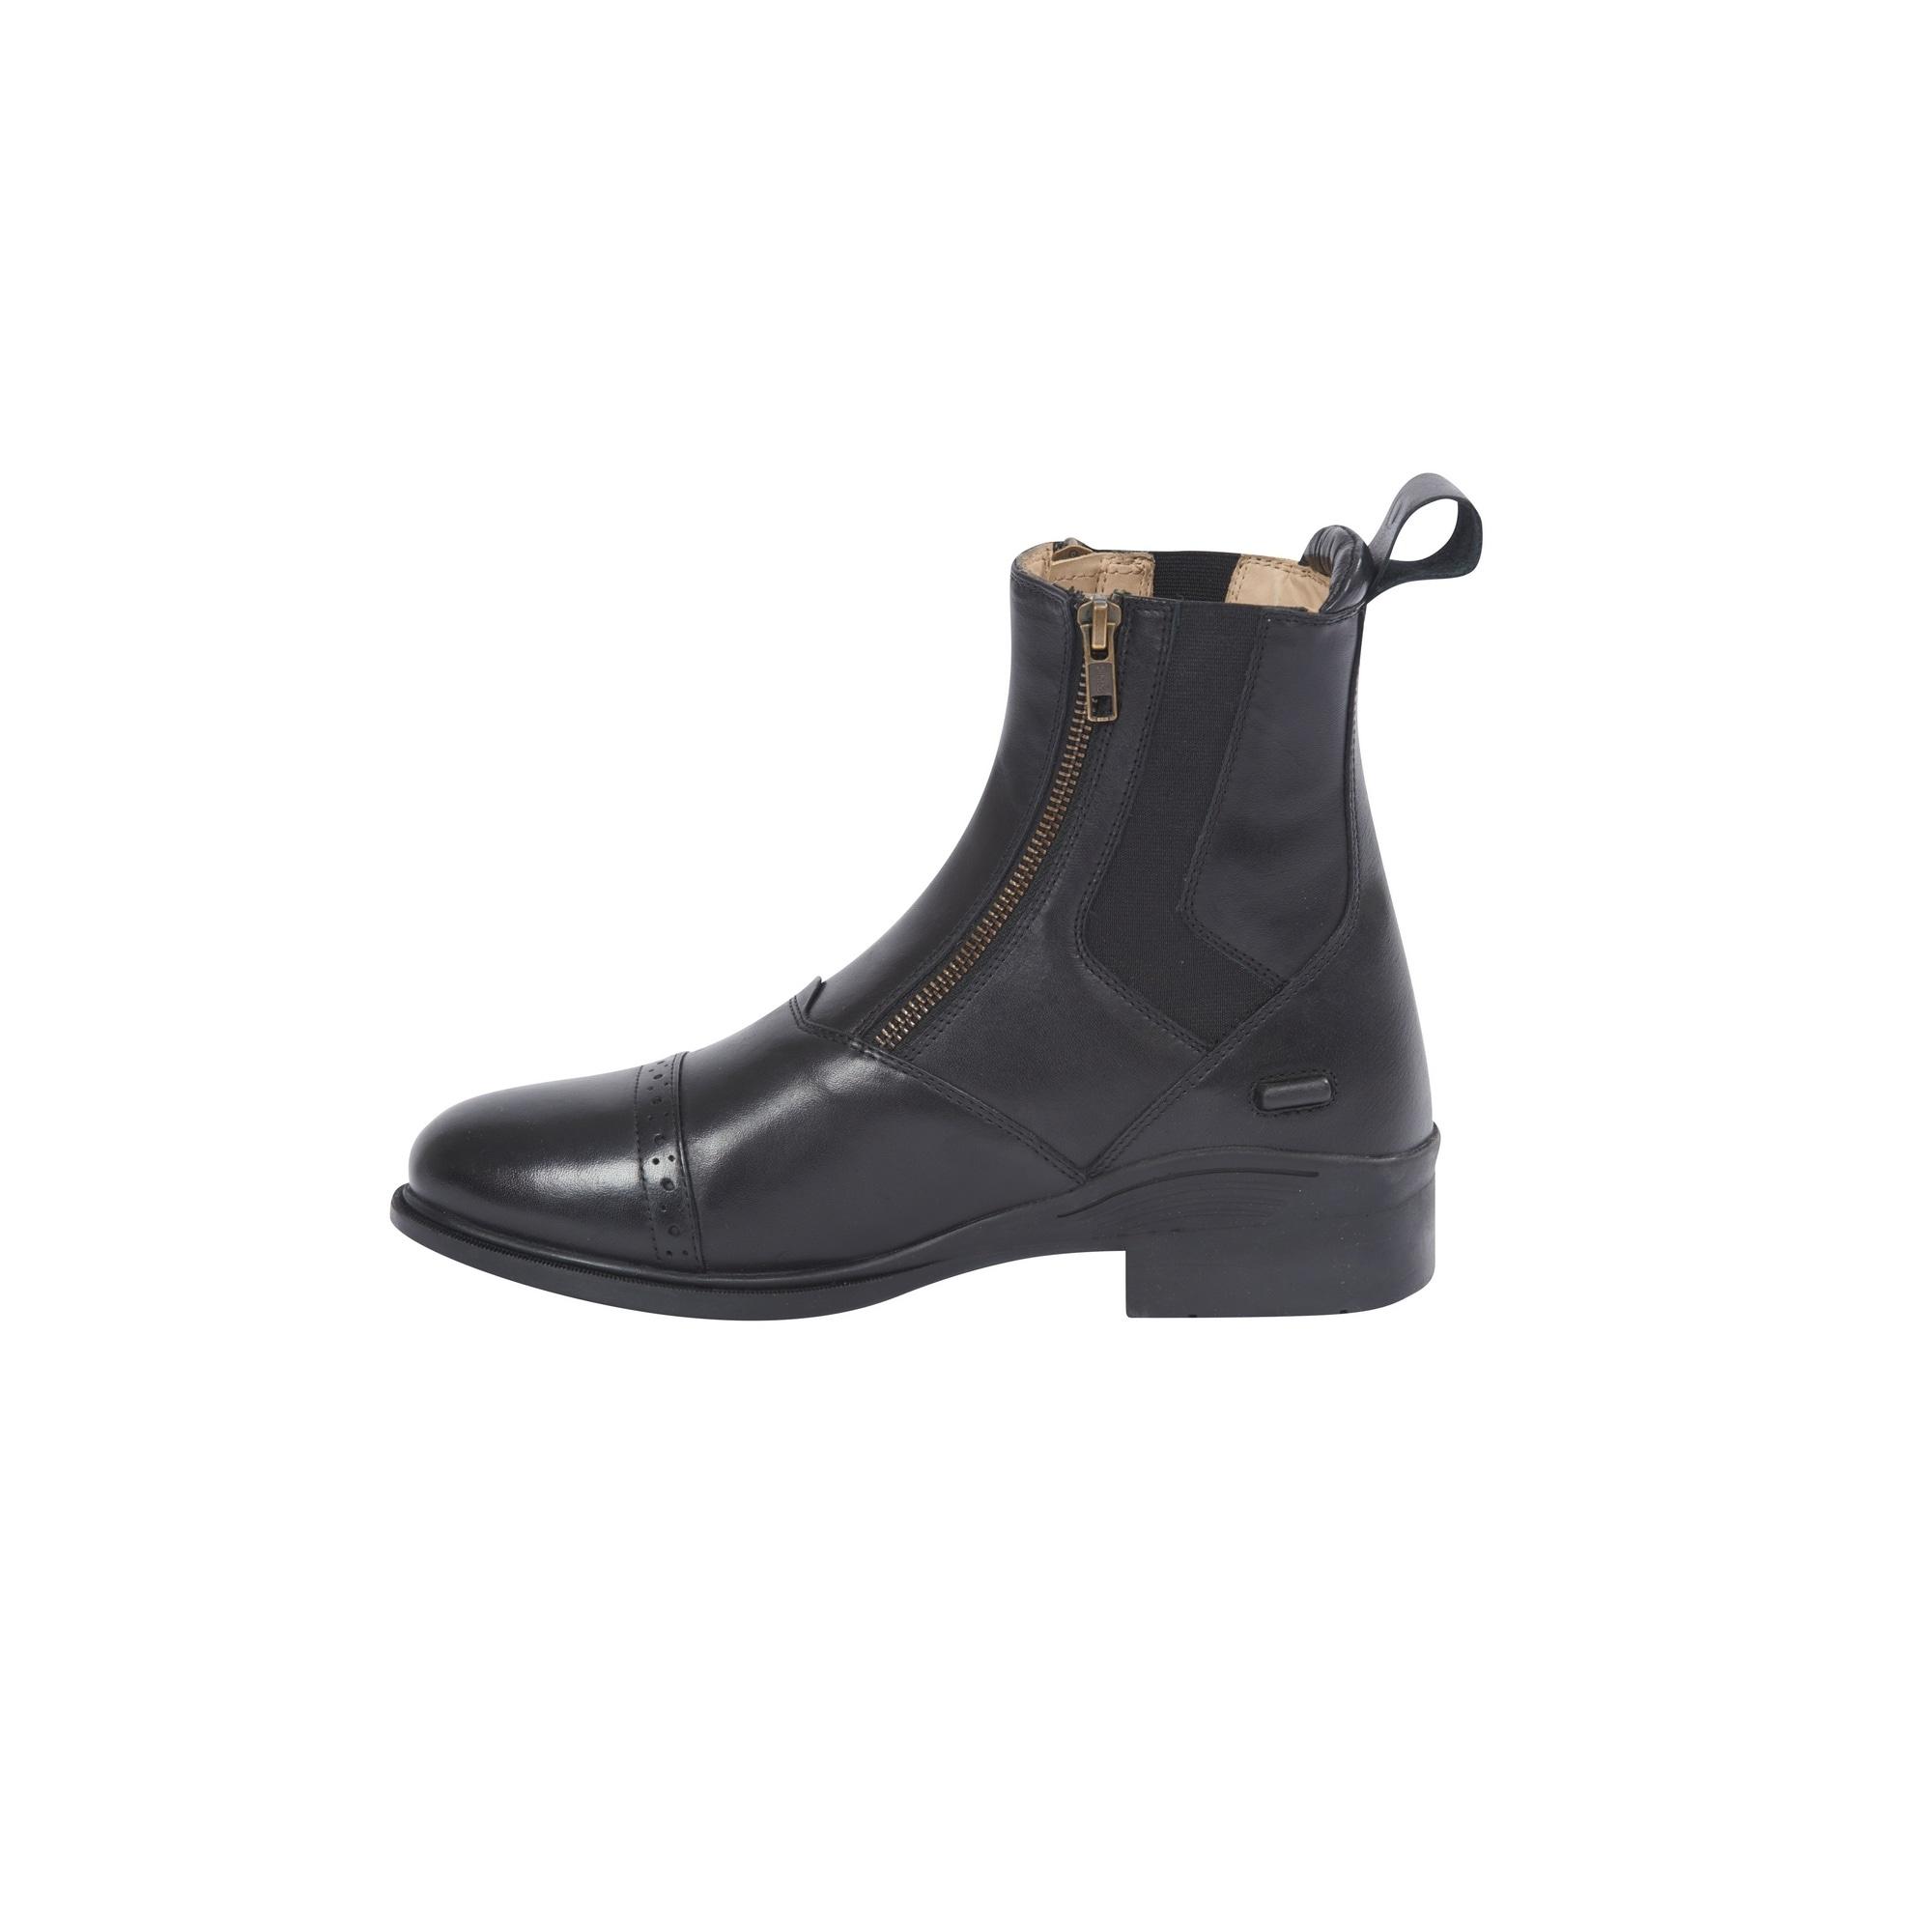 Image of Dublin Reitstiefel »Evolution Unisex Doppel-Zip Leder Paddock Stiefel«